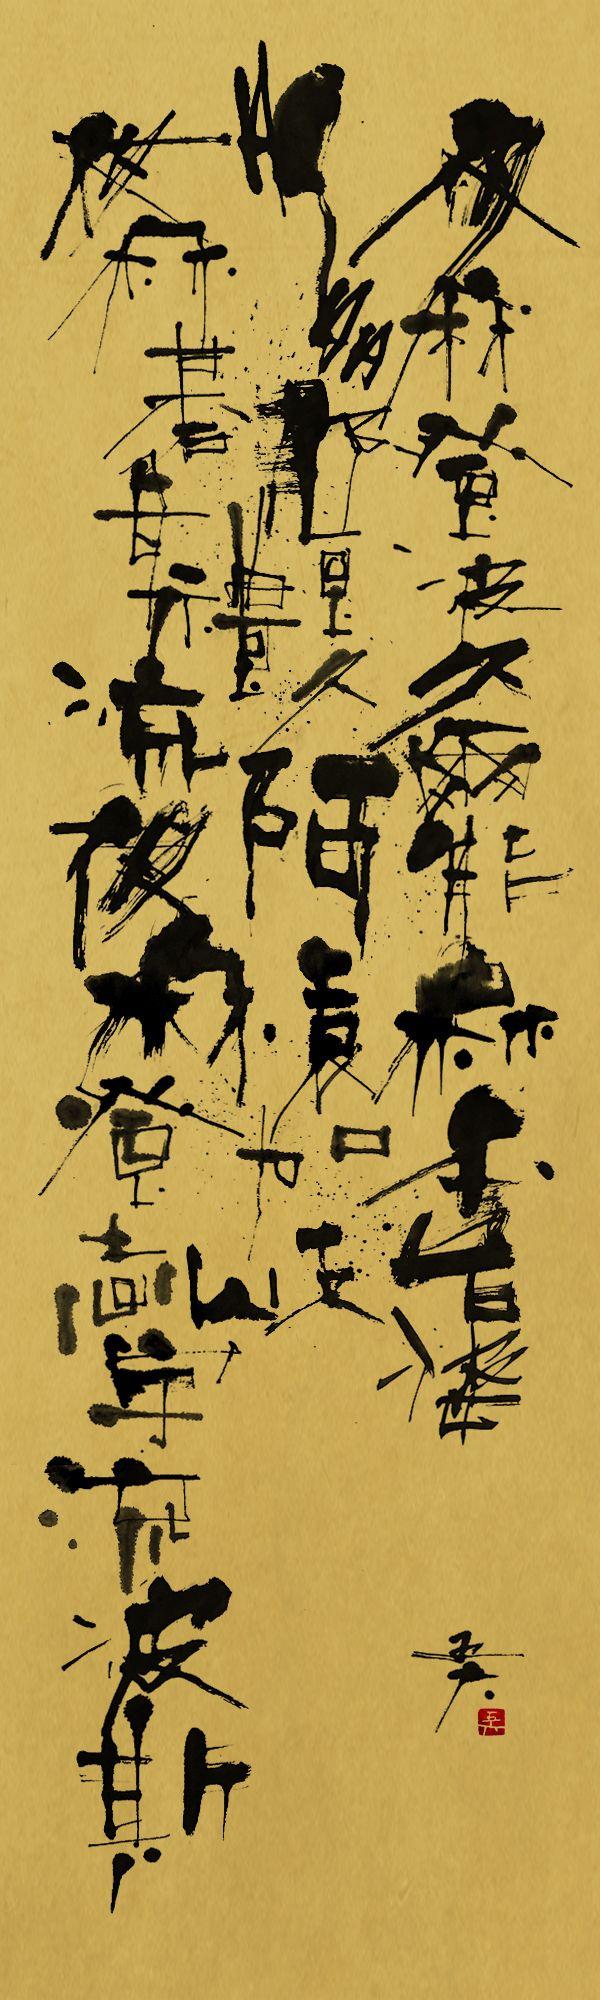 倭建命 望郷歌 Songs of Nihonshoki 書道作品 calligraphy